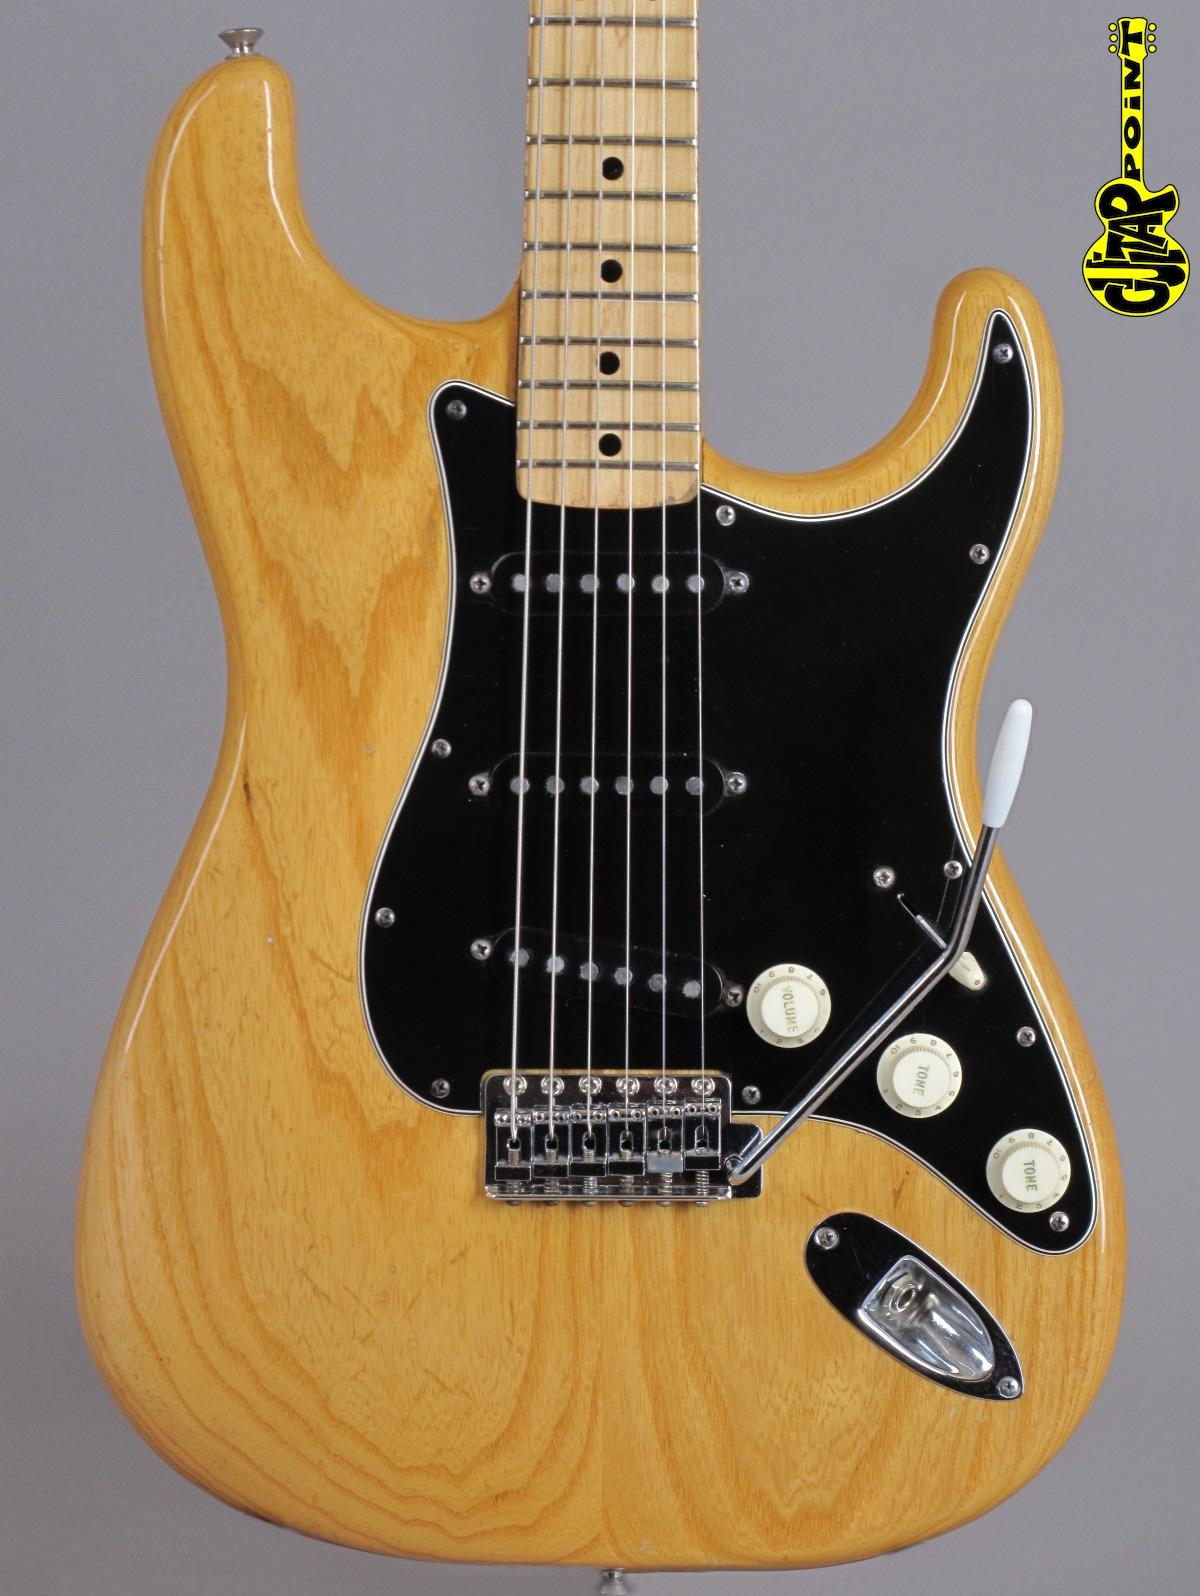 1976 Fender Stratocaster - Natural